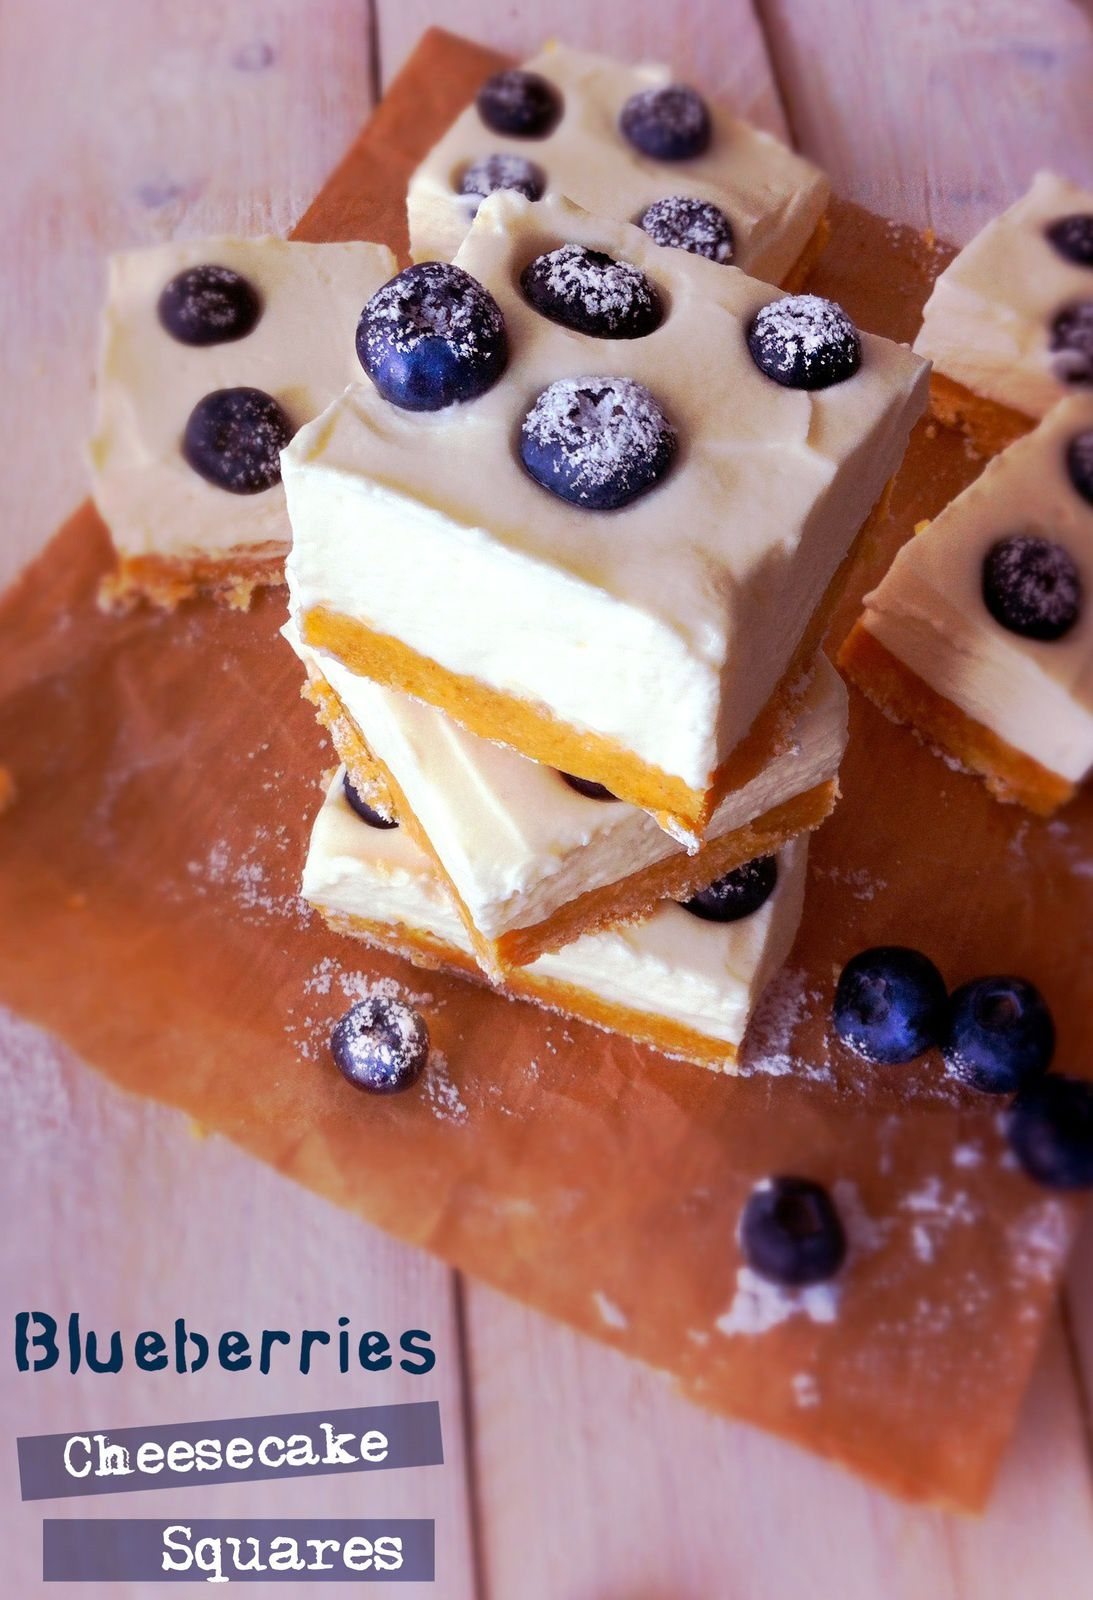 Cheesecake squares mascarpone et myrtille